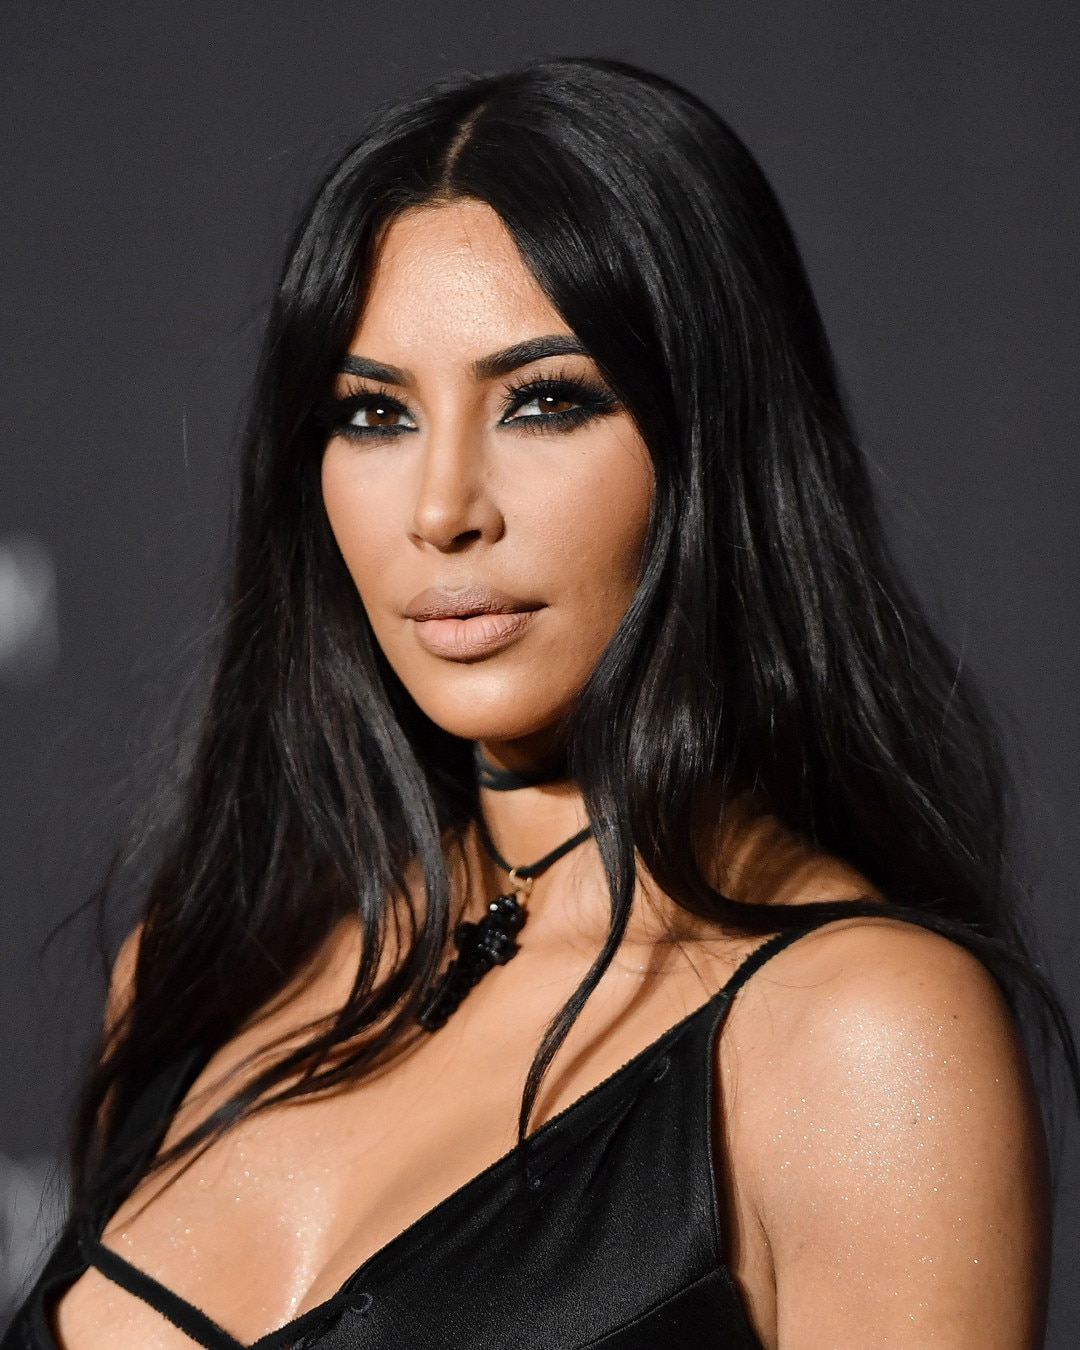 Fotos Kim Kardashian nudes (83 photo), Topless, Fappening, Instagram, swimsuit 2018